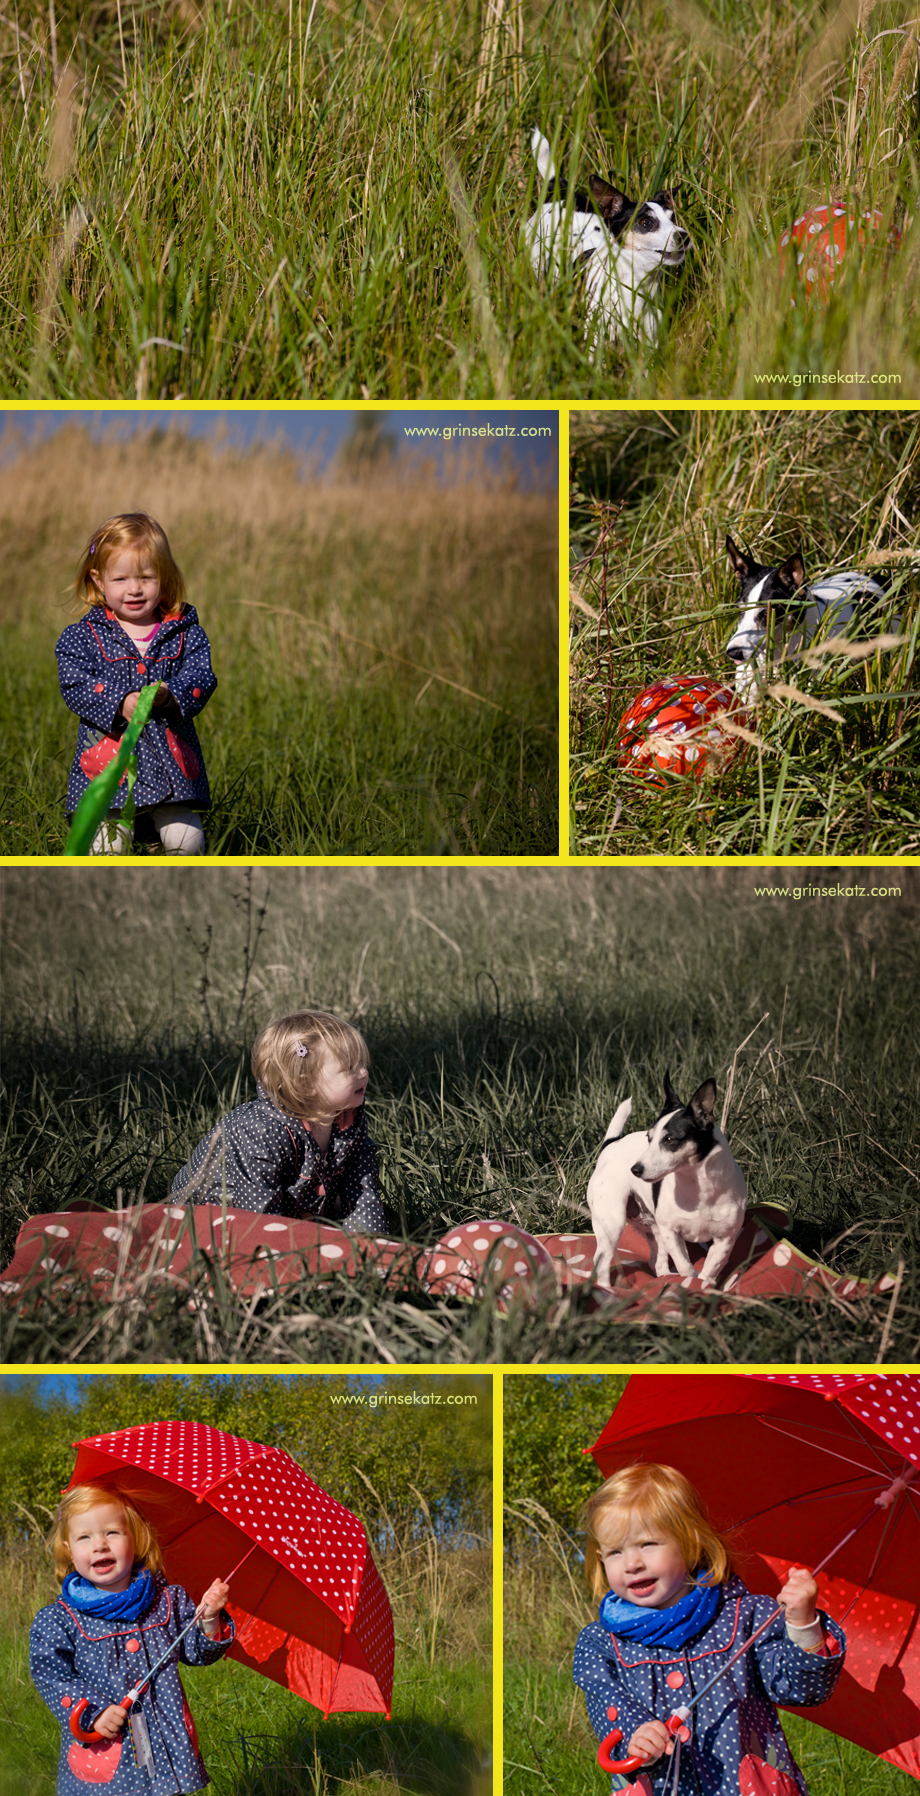 styled-outdoor-fotos-kinderfotografie-uckermark-grinsekatz